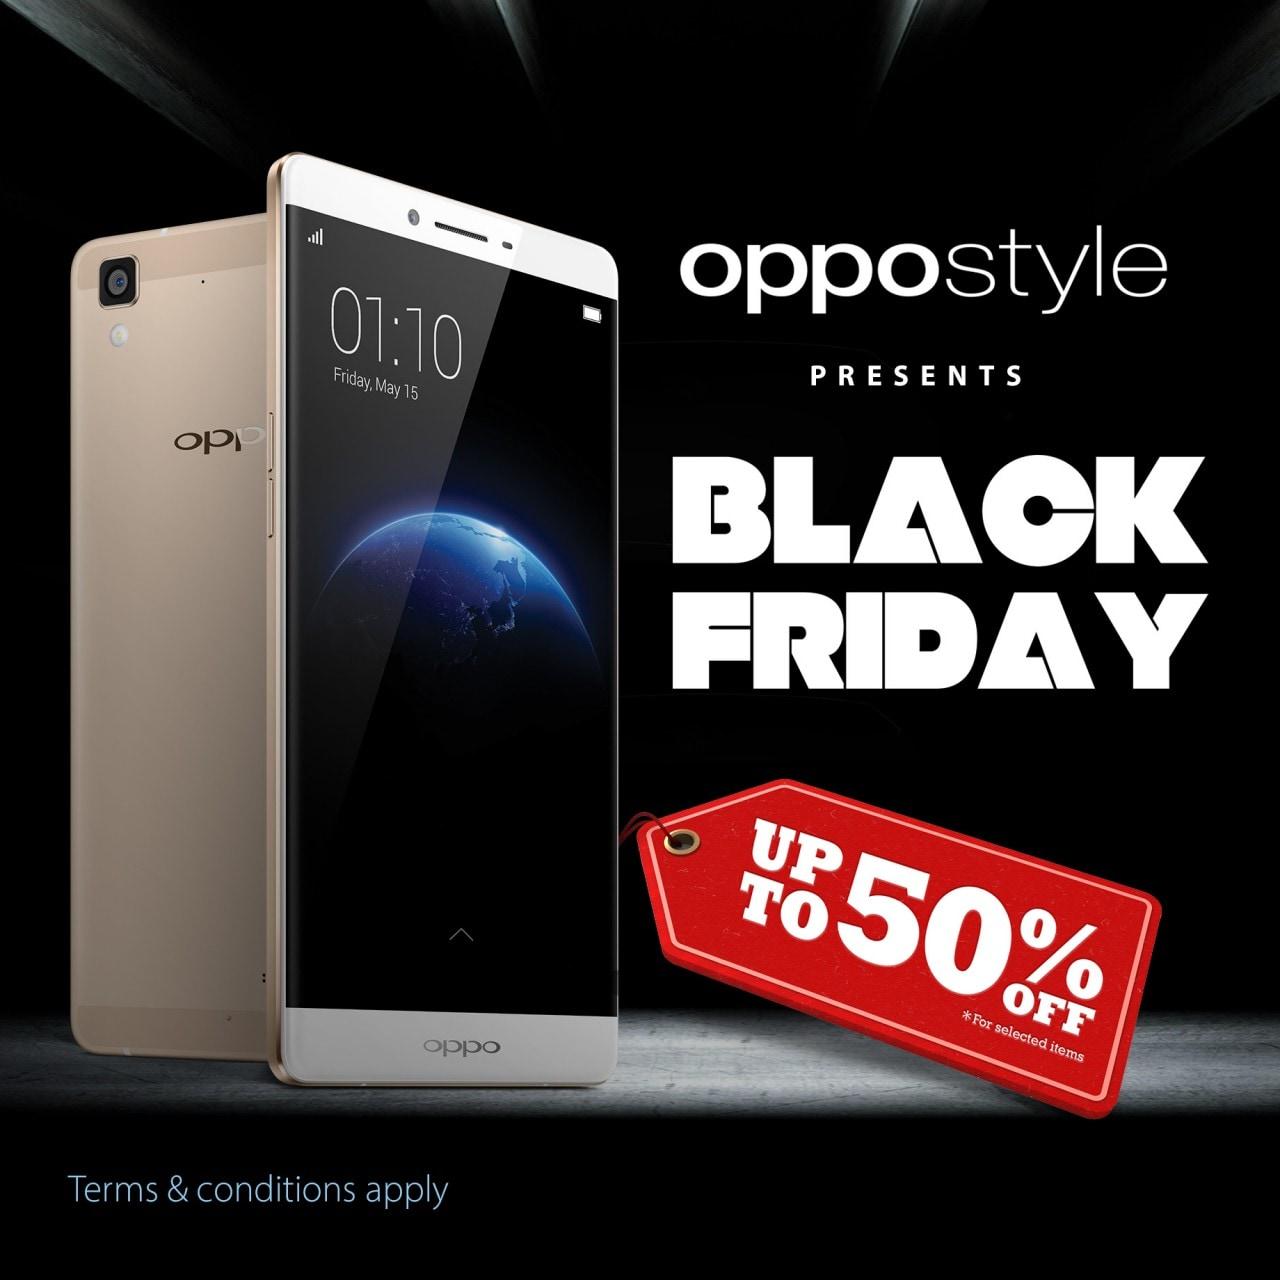 Black Friday Oppo